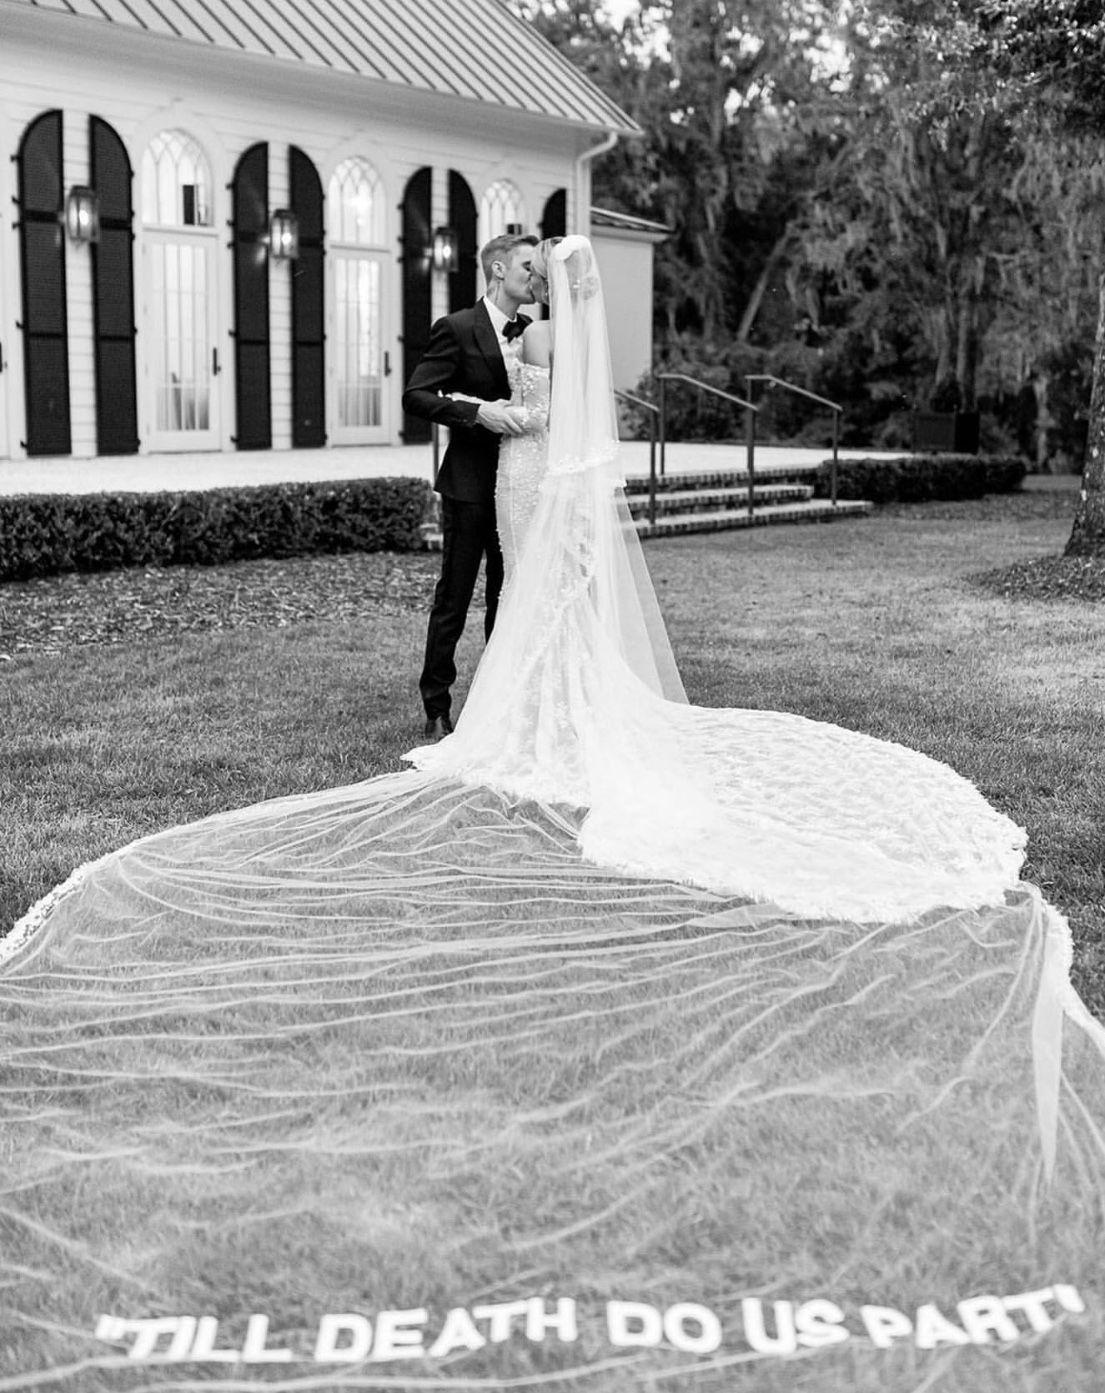 Pin By Yinet On Perfect Weddings Brian Melissa Off White Wedding Dresses Celebrity Wedding Dresses Hailey Baldwin Wedding Dress